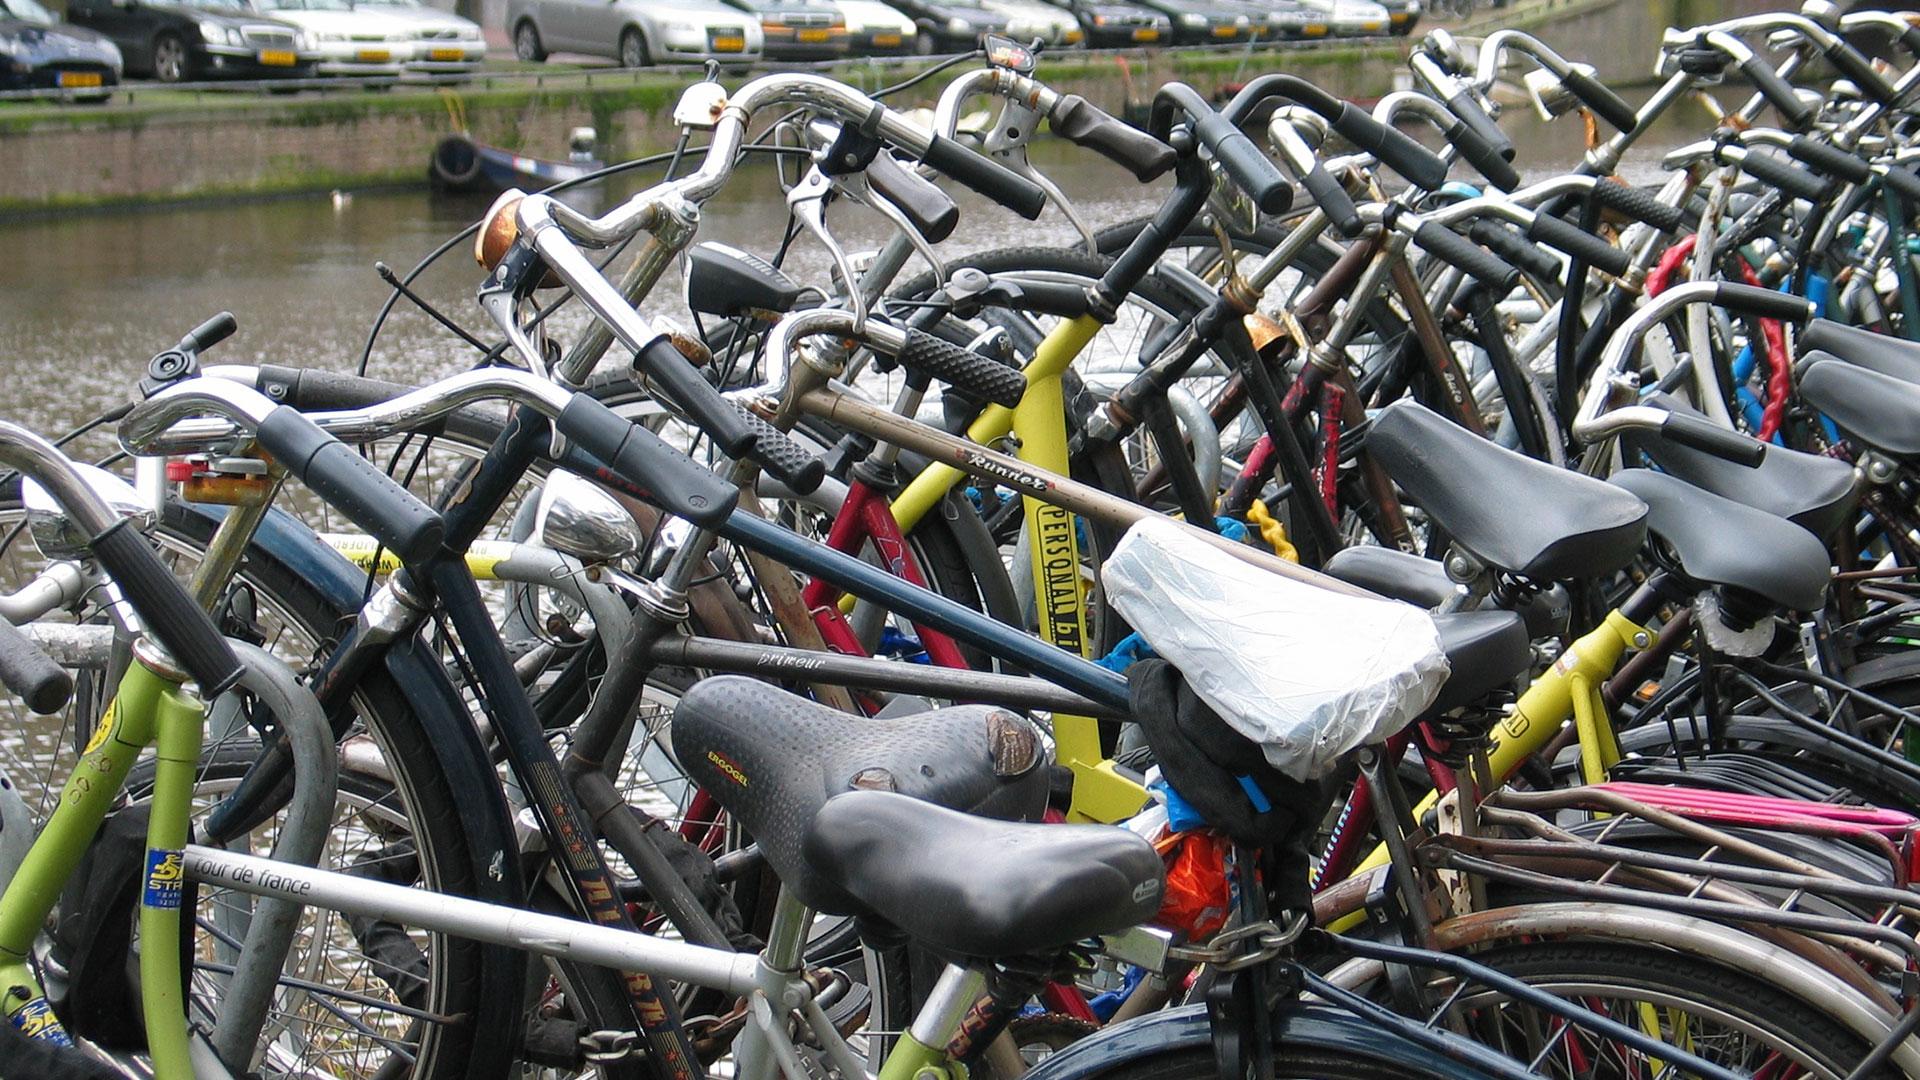 Woon-werkverkeer op de fiets? Ga op woensdag!